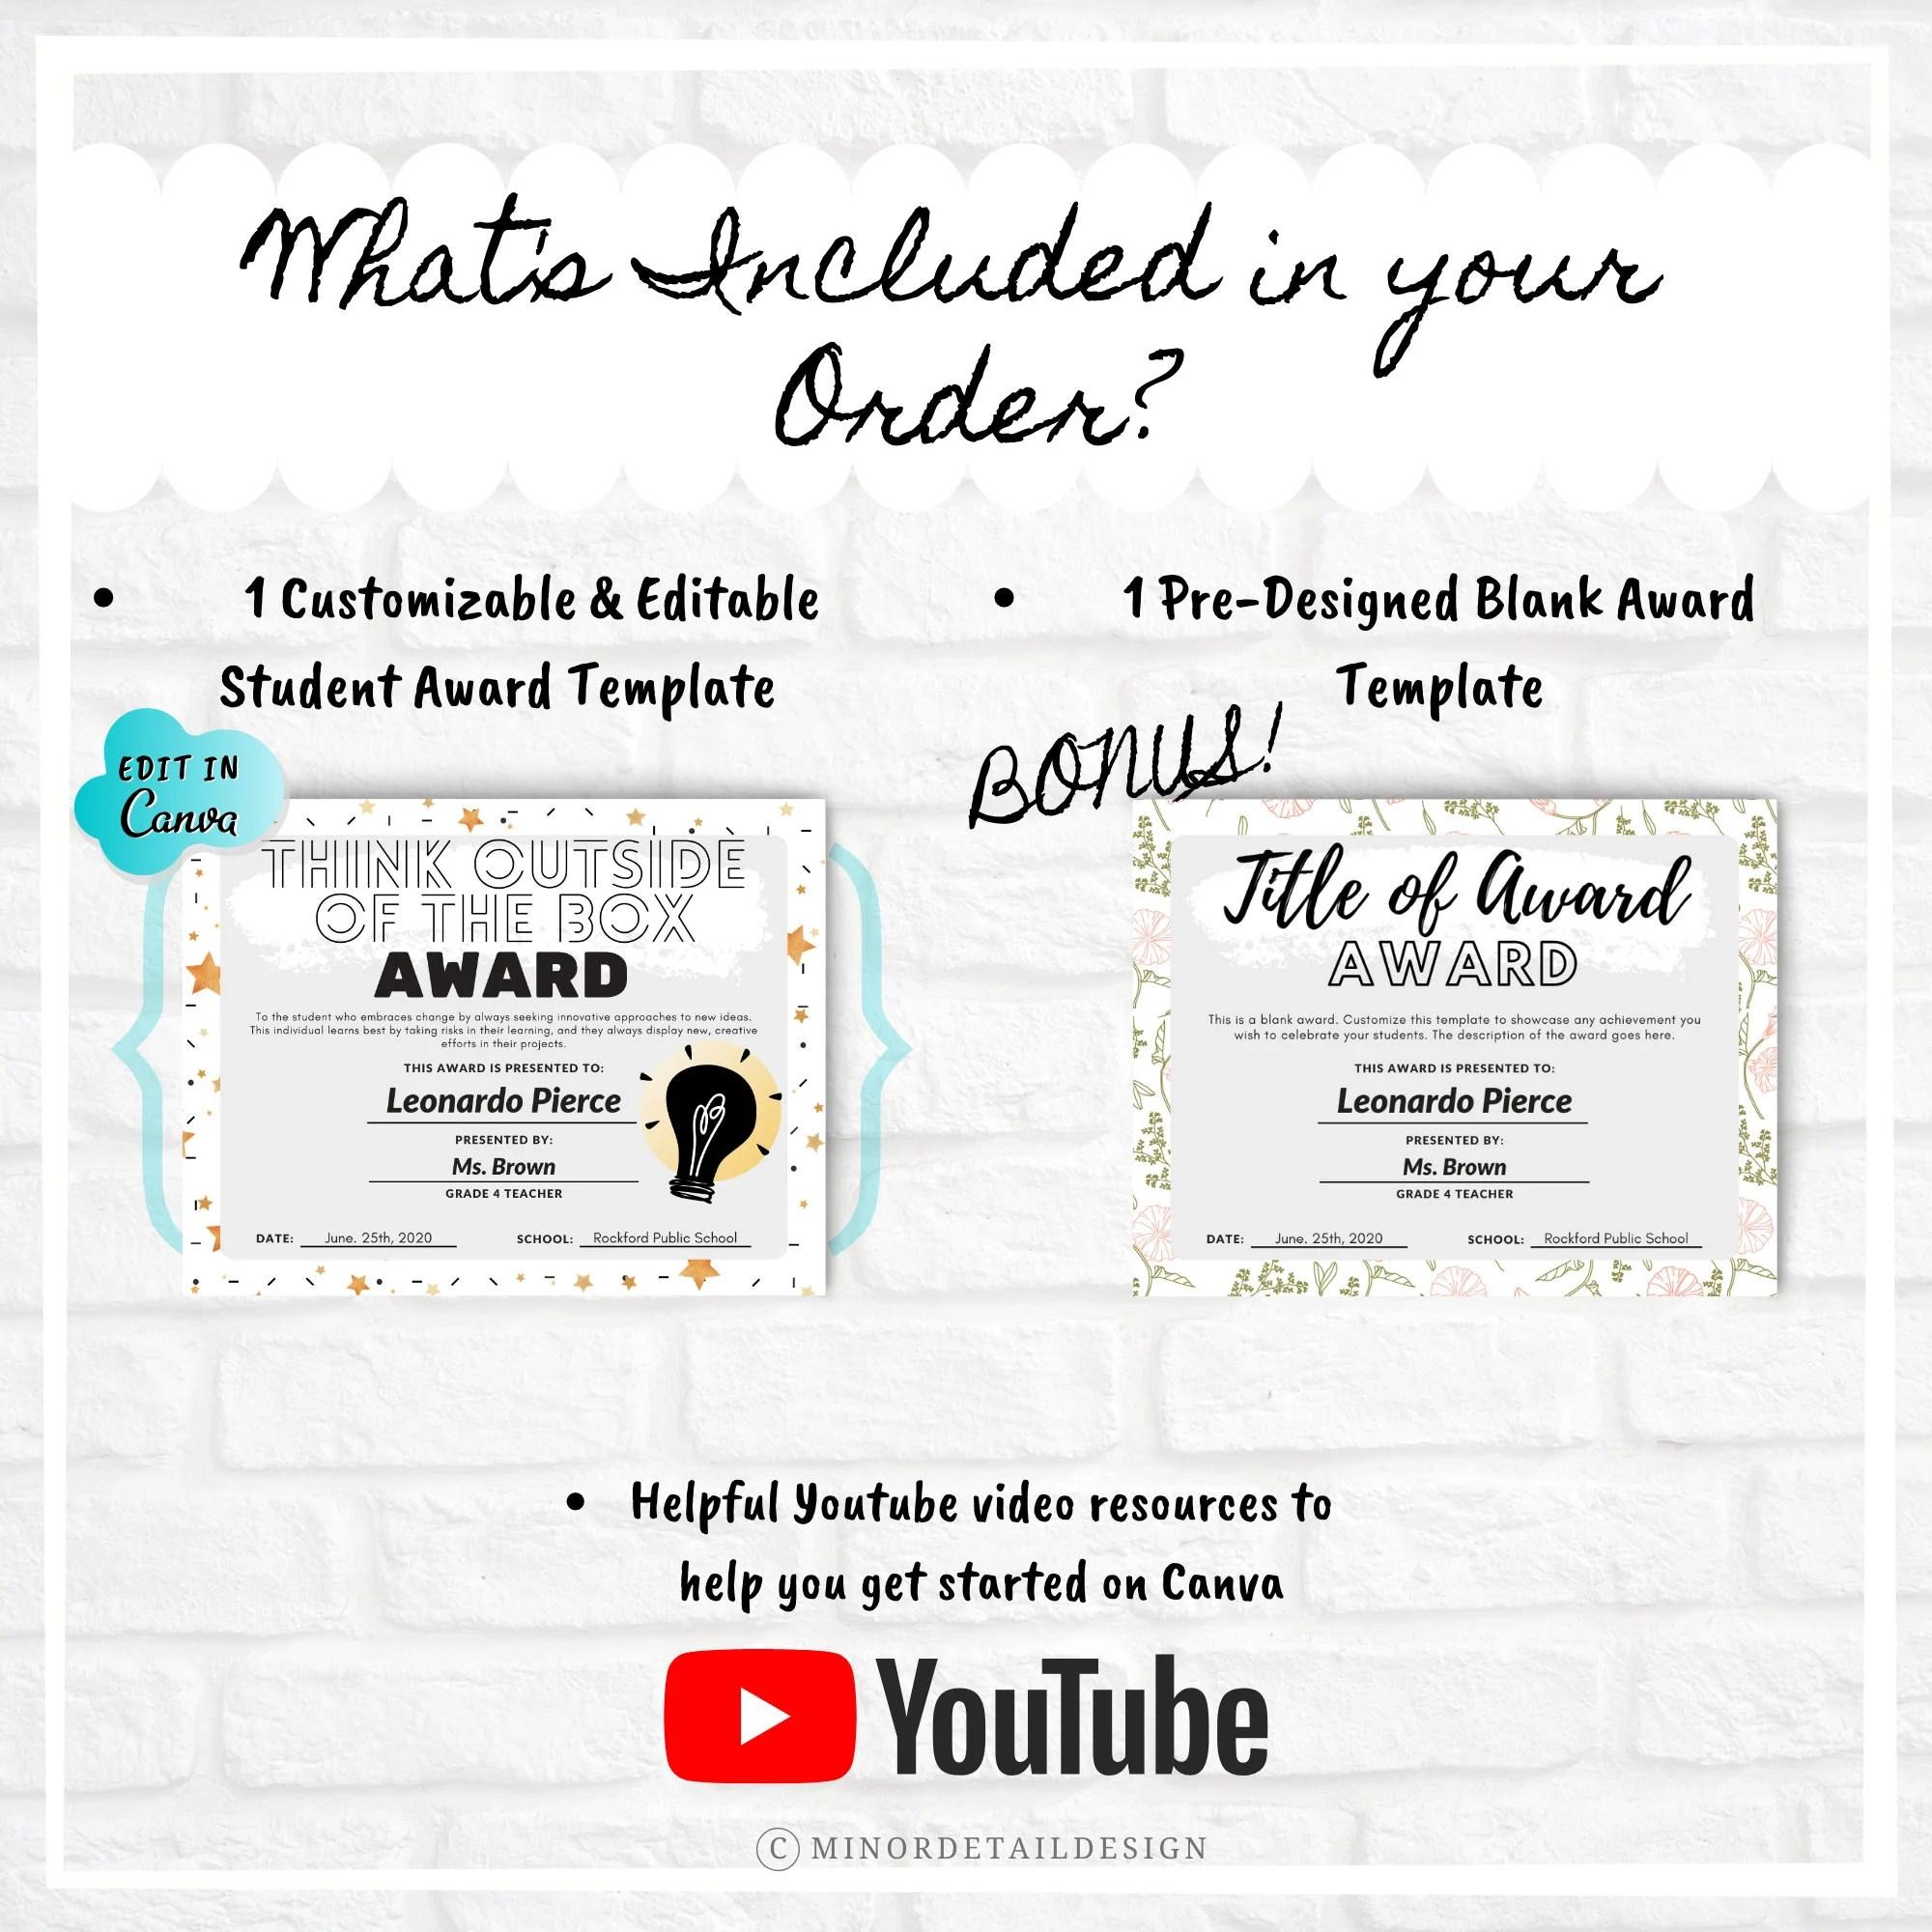 EDITABLE School Award School Award Template Student Award